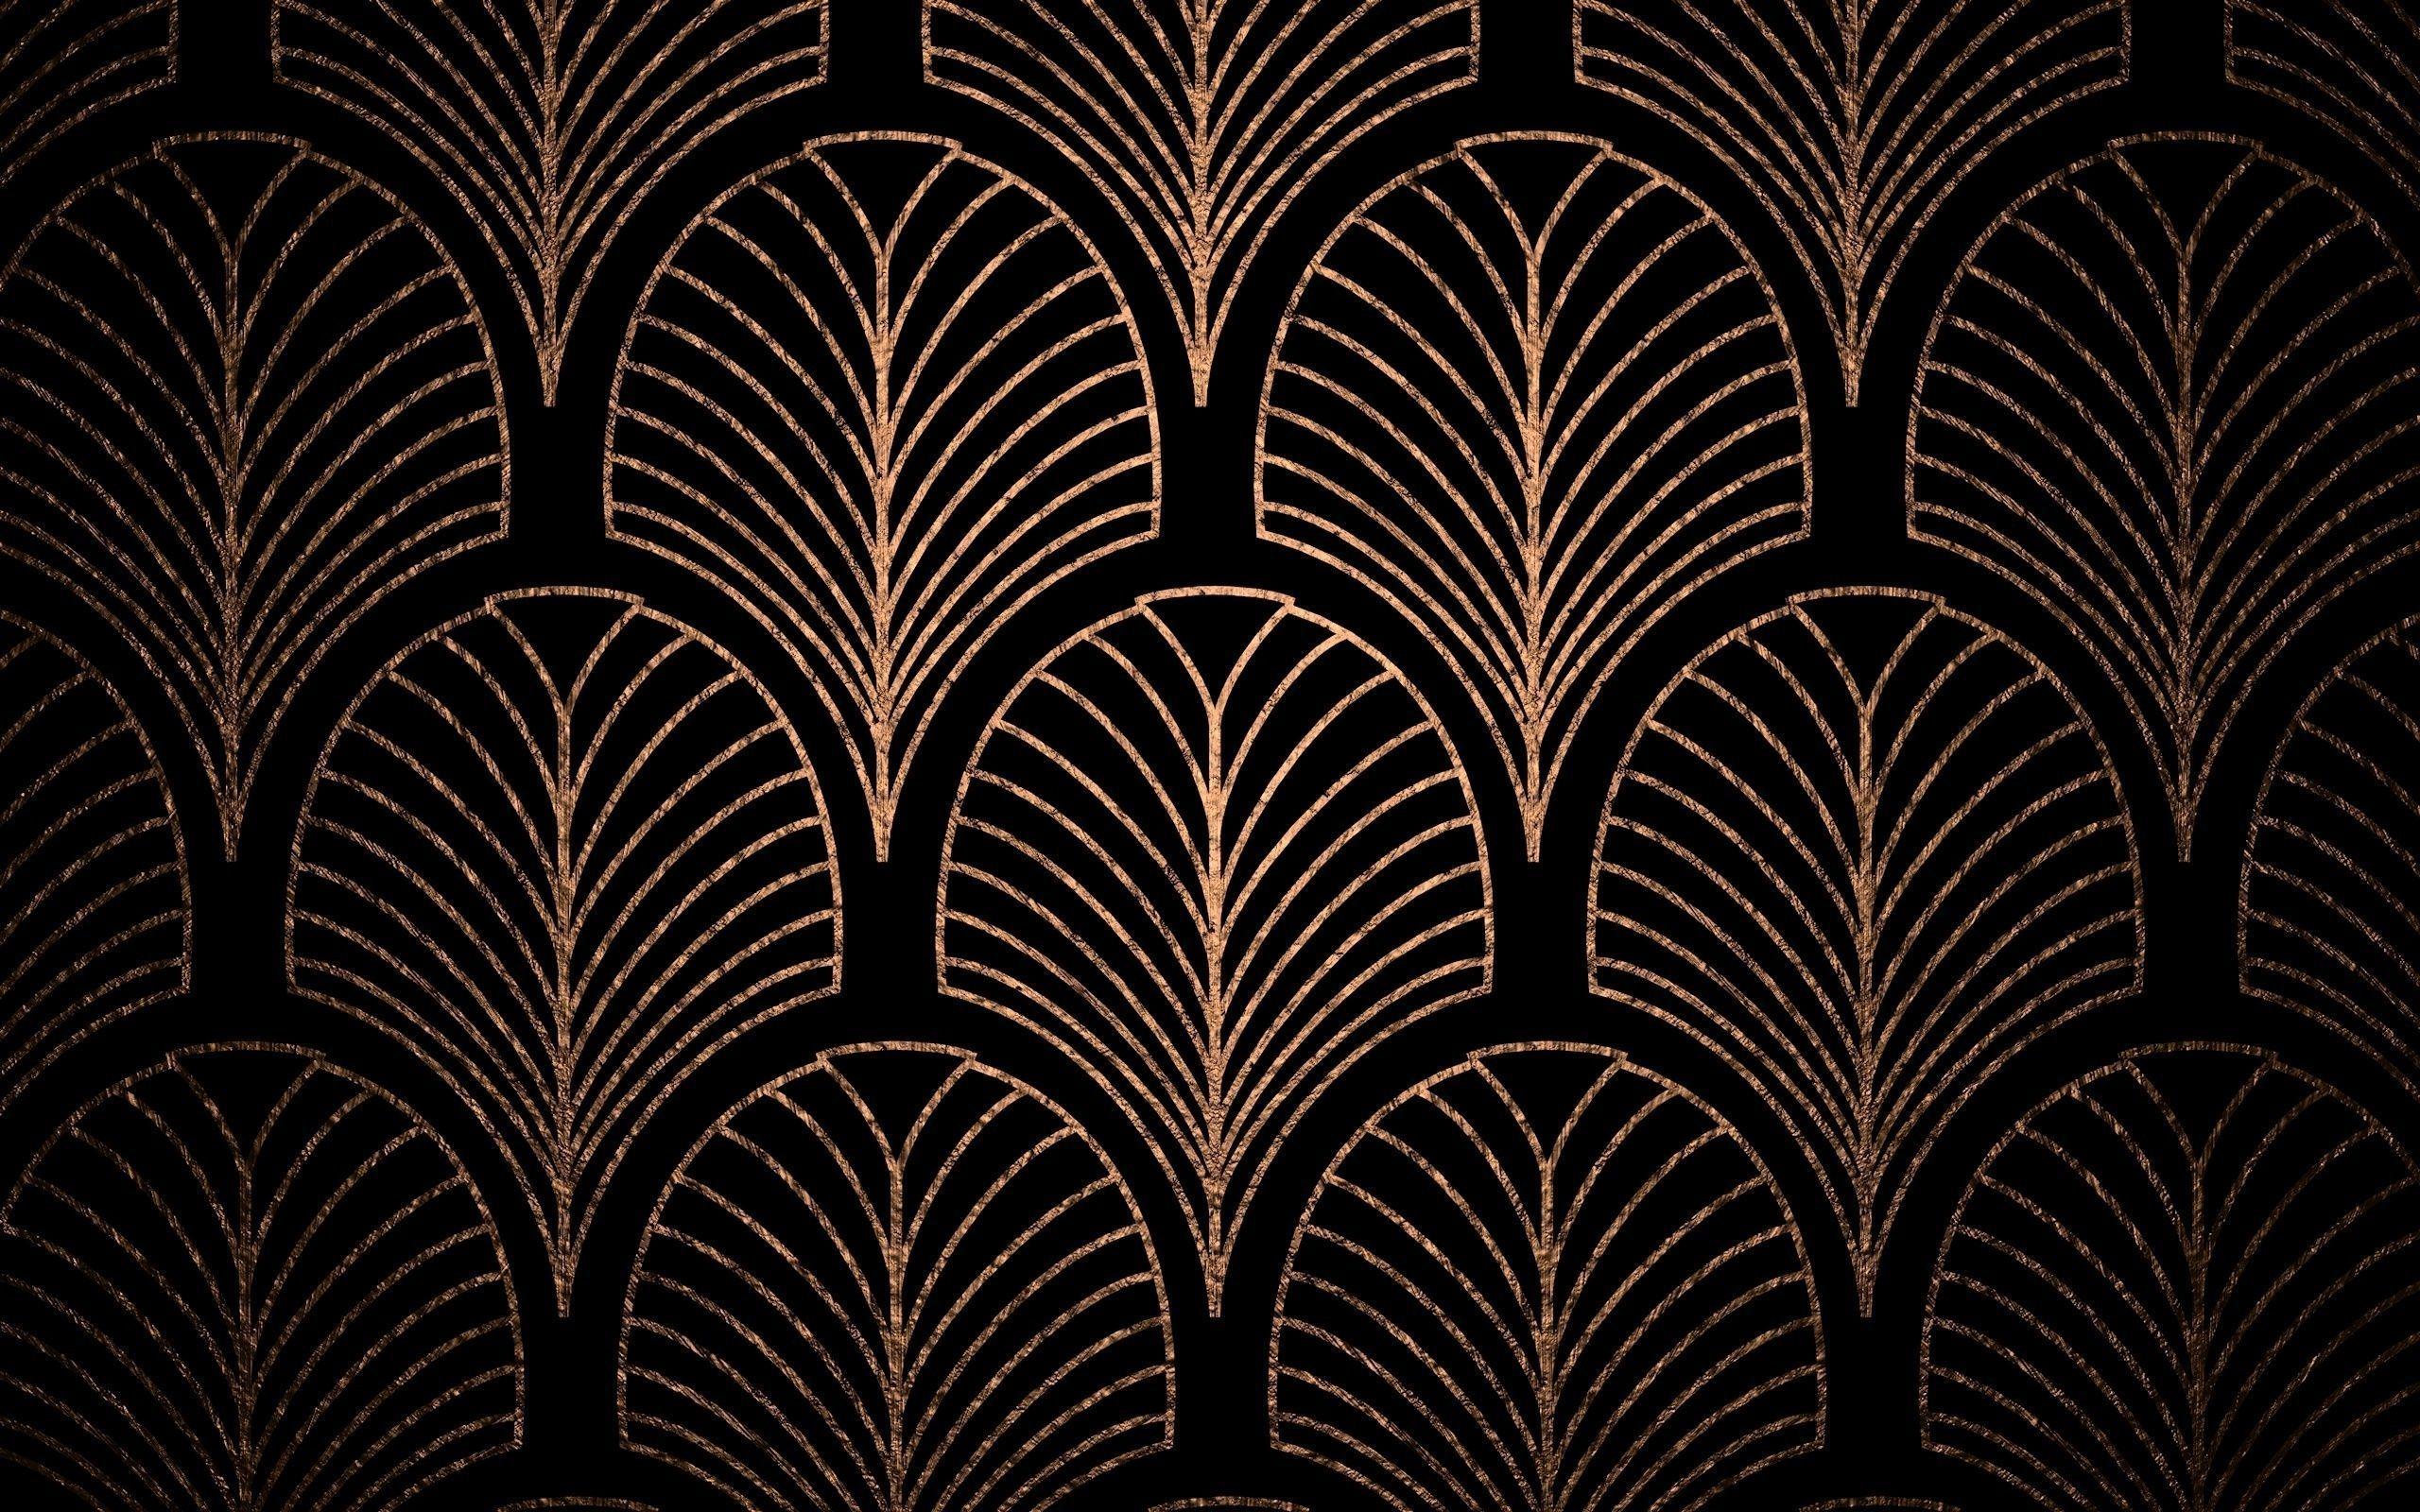 3d Wallpaper For Kitchen 3d Model Art Deco Style Vr Ar Low Poly Fbx C4d Stl Dae